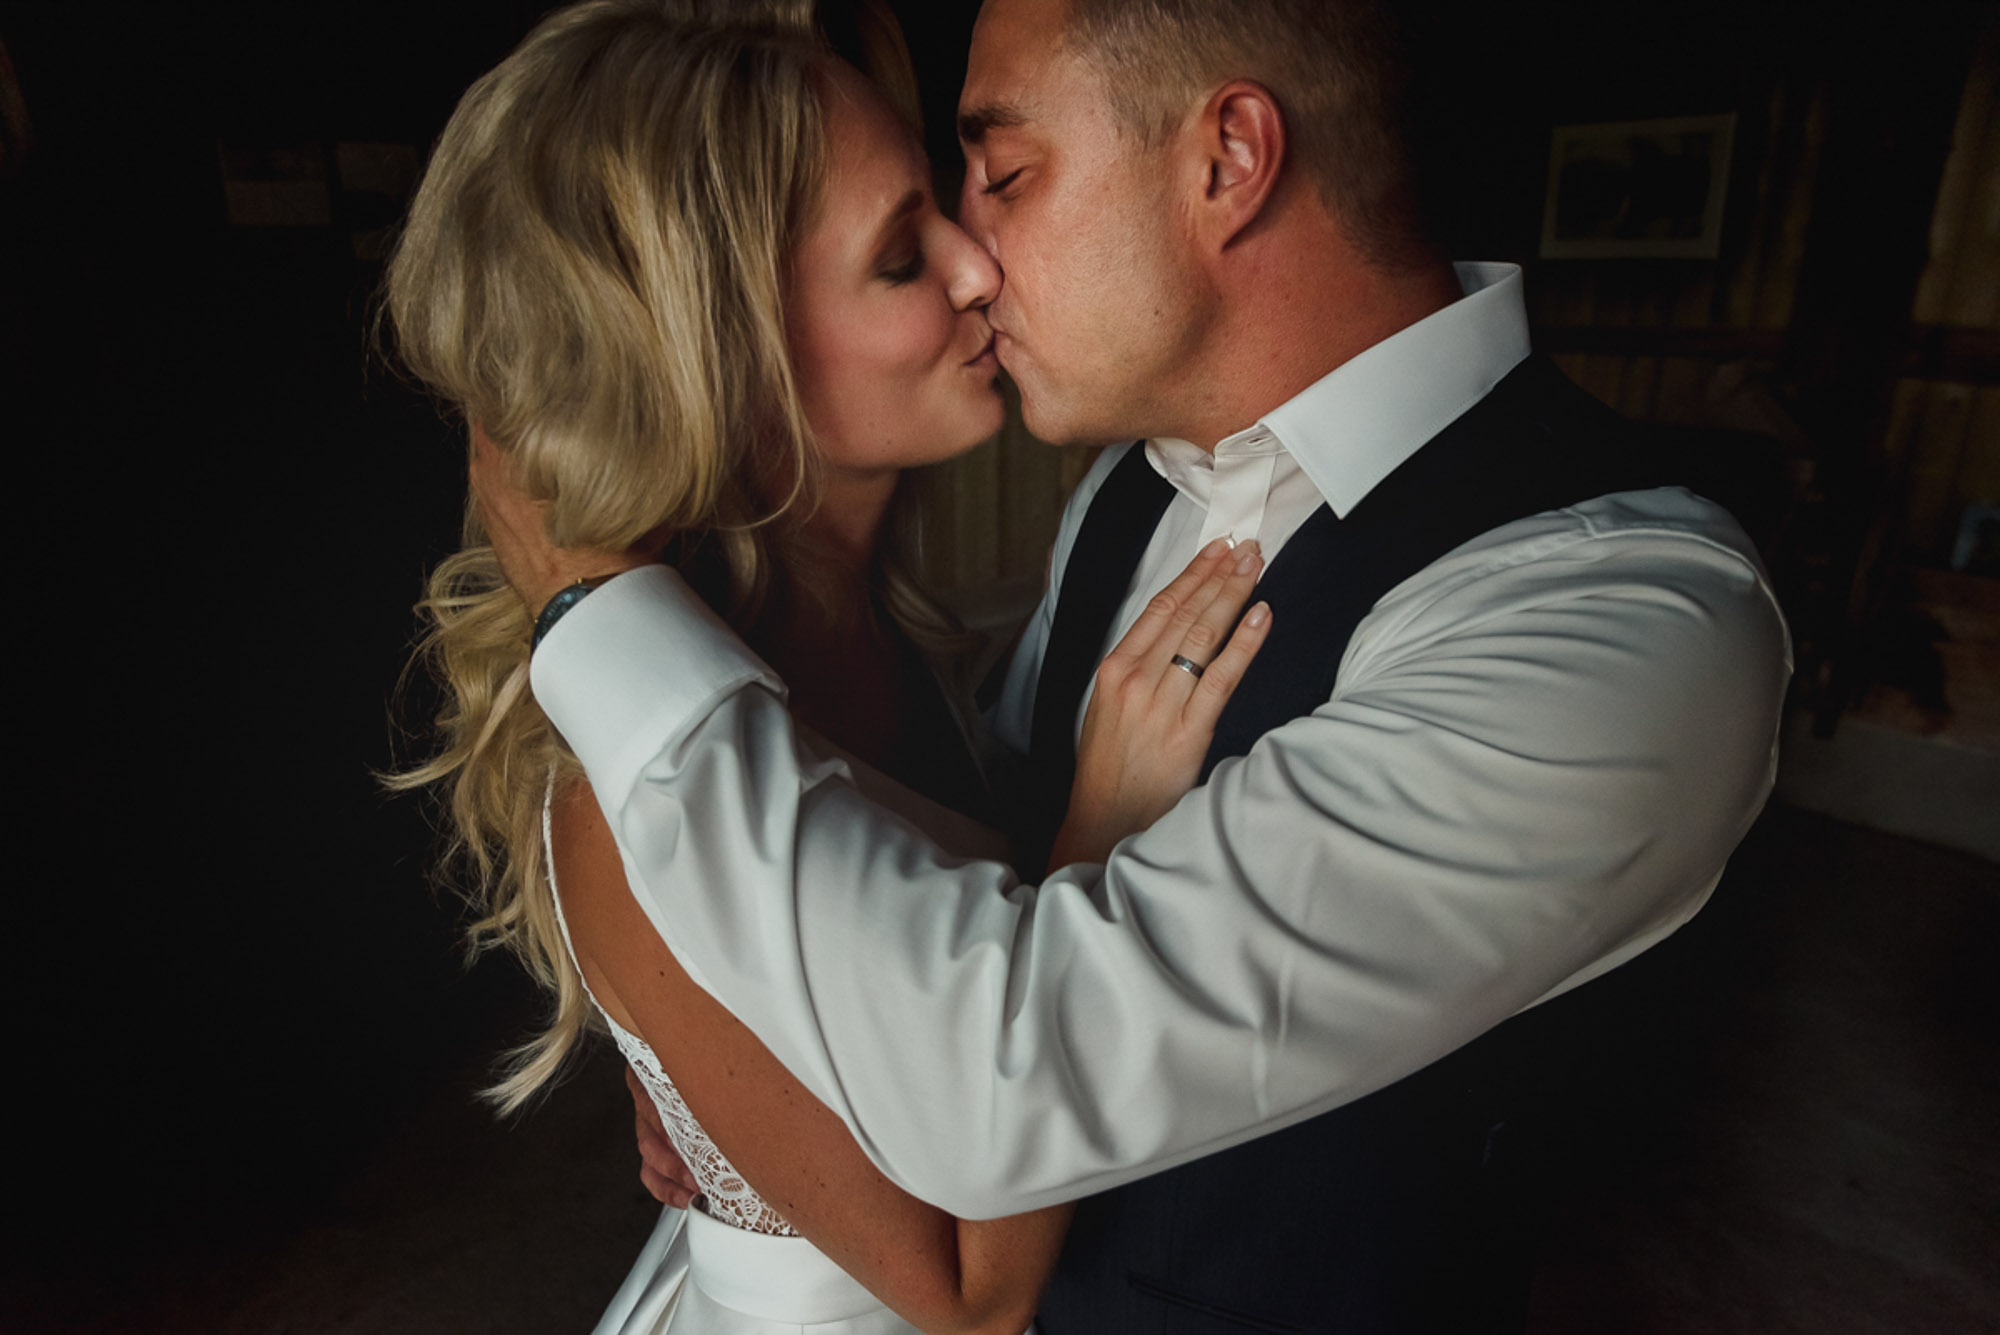 WeGraphy-Wedding Photography- after wedding